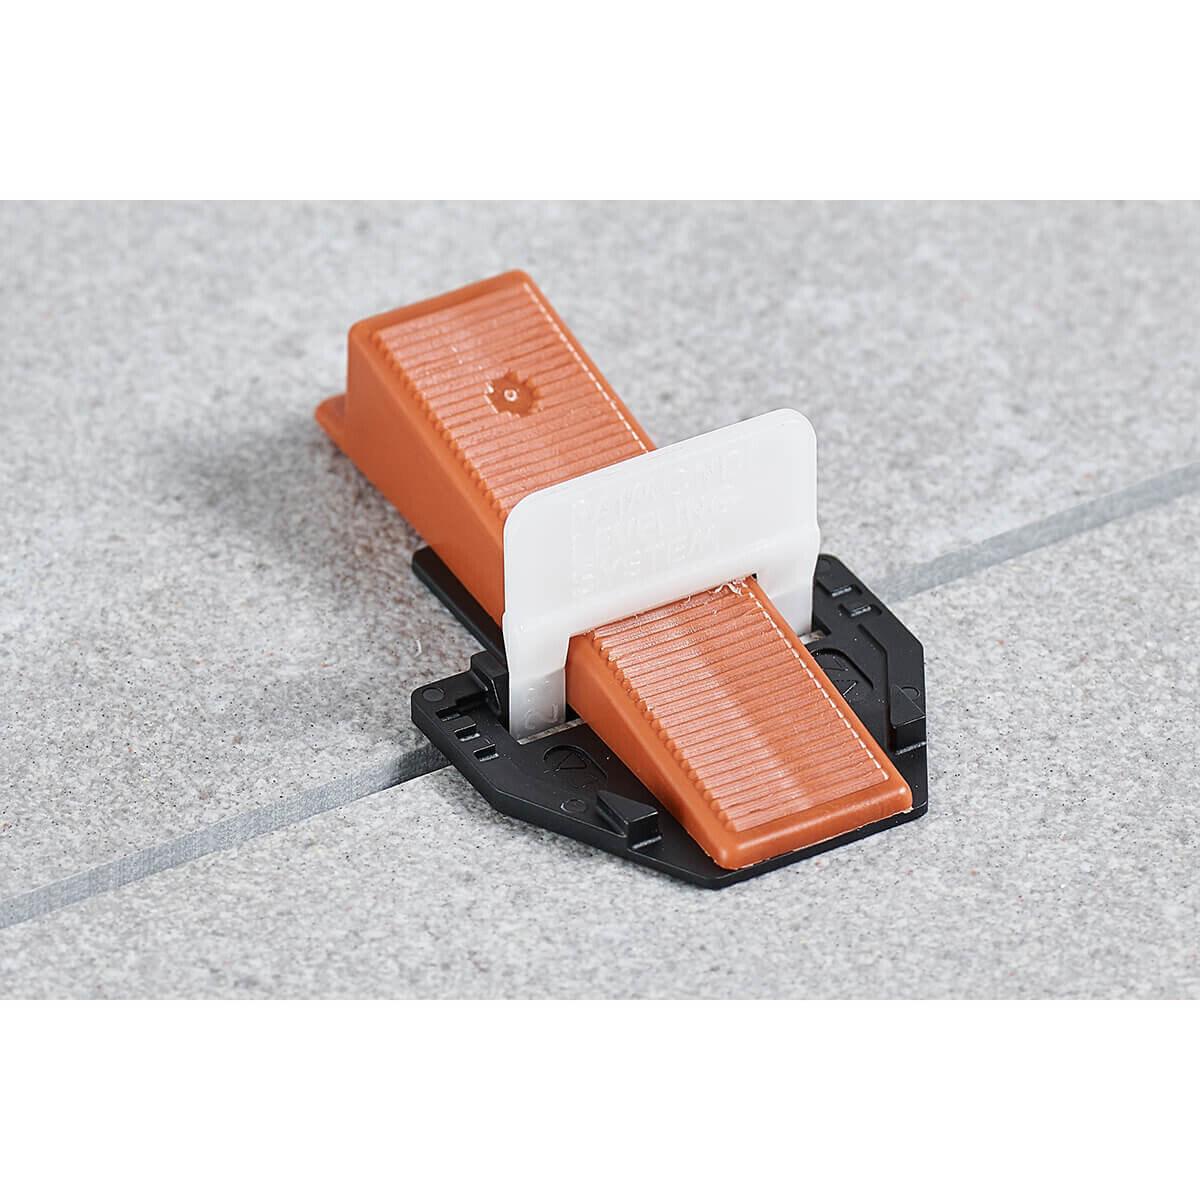 Raimondi Protecting Platform with Tile Leveling Clip and Wedge